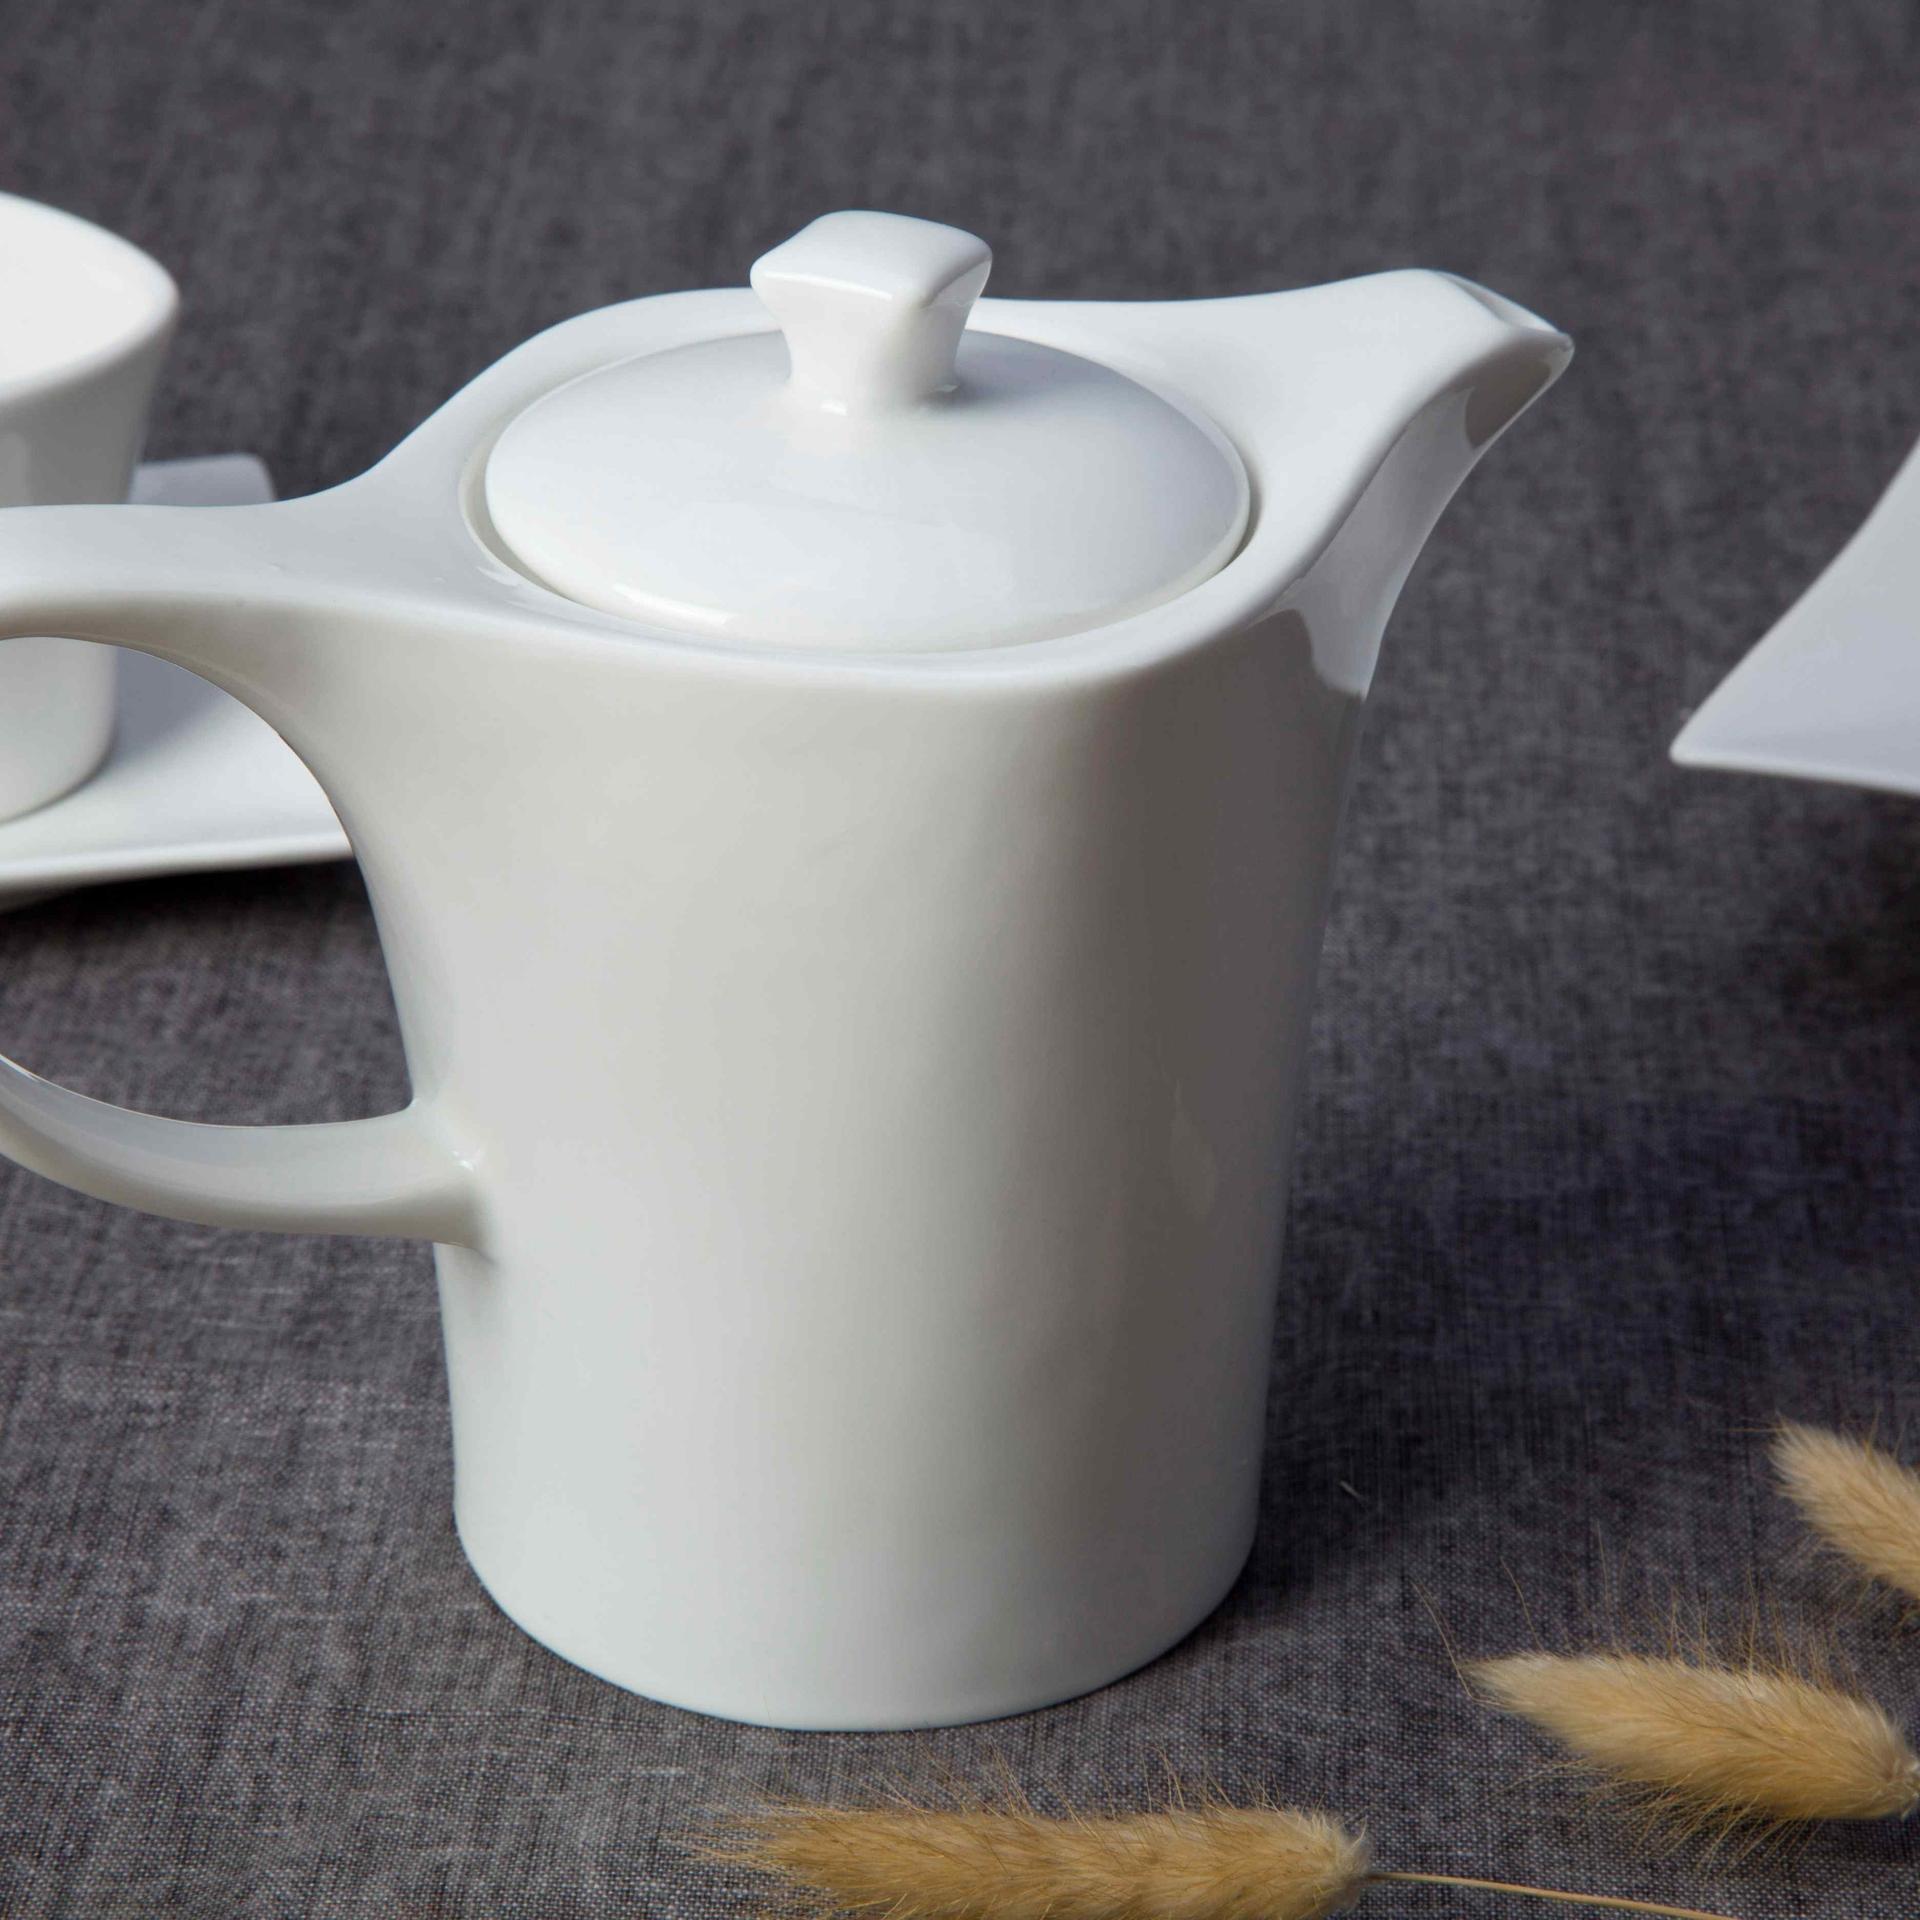 Ivory white ceramic dinnerware set -  TW21